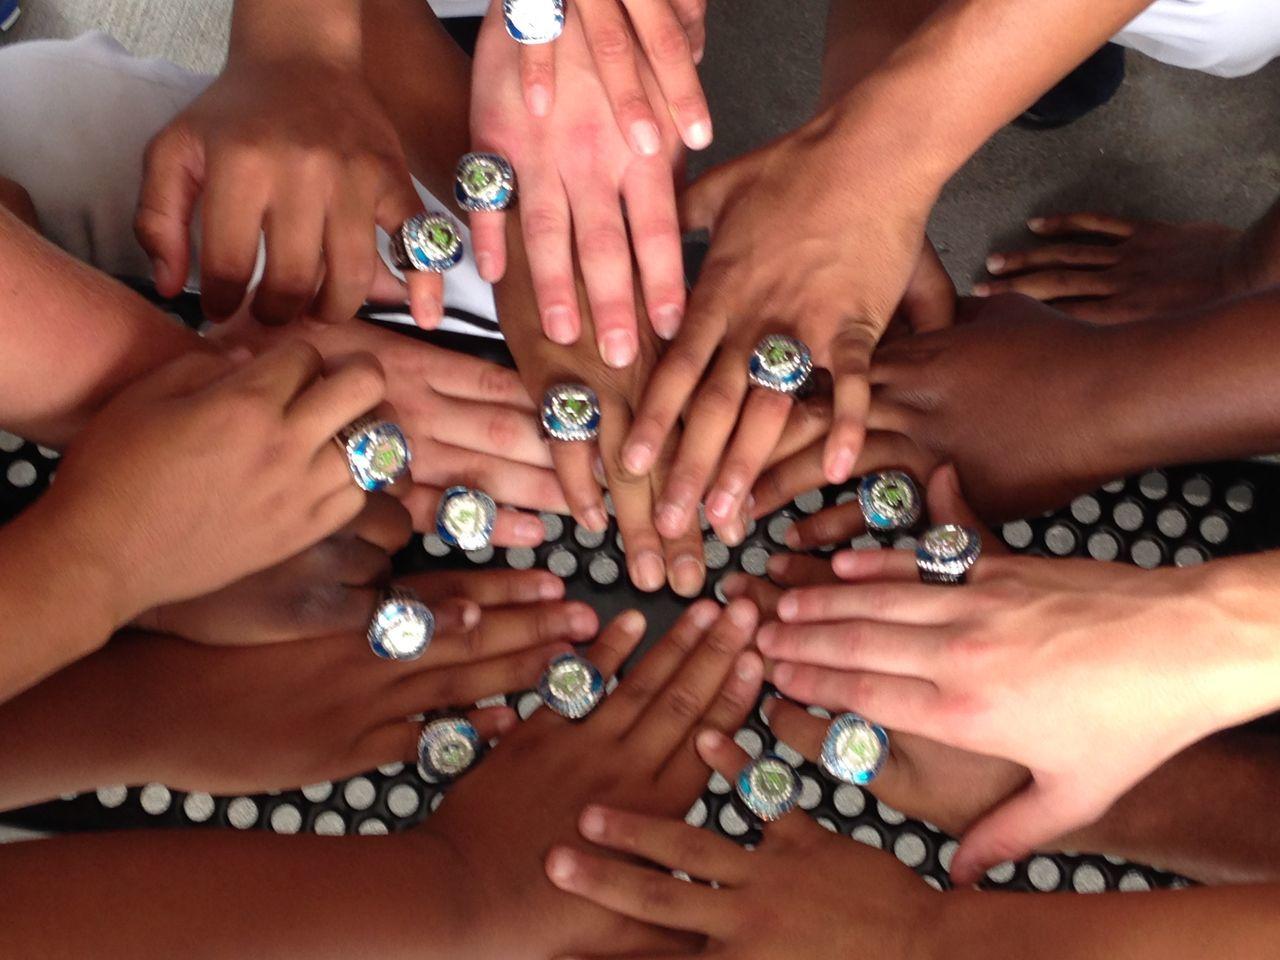 WINNING!! Championship Wanting This!